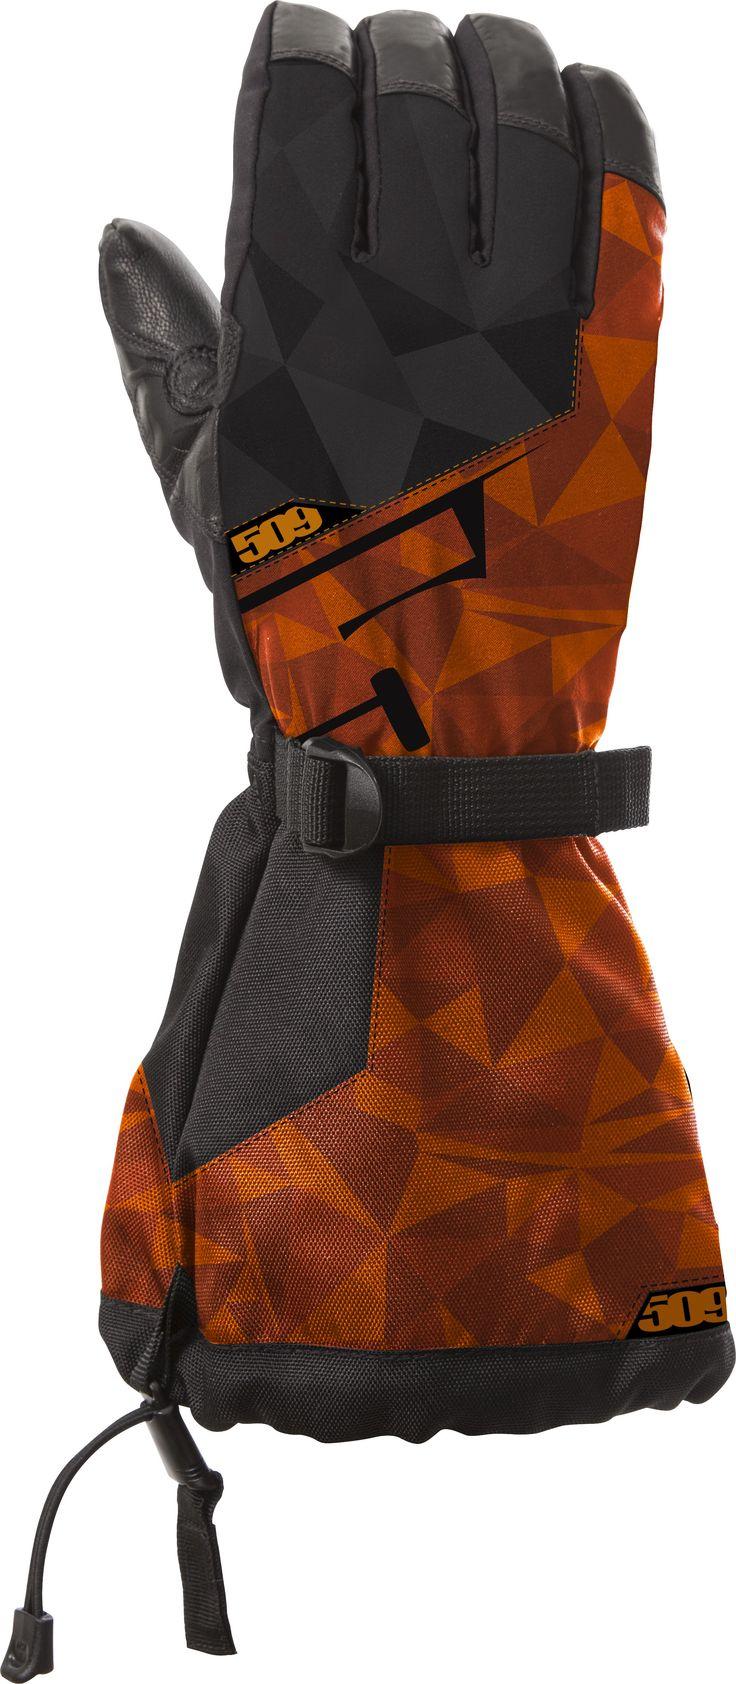 509 Backcountry Snowmobile Gloves Orange